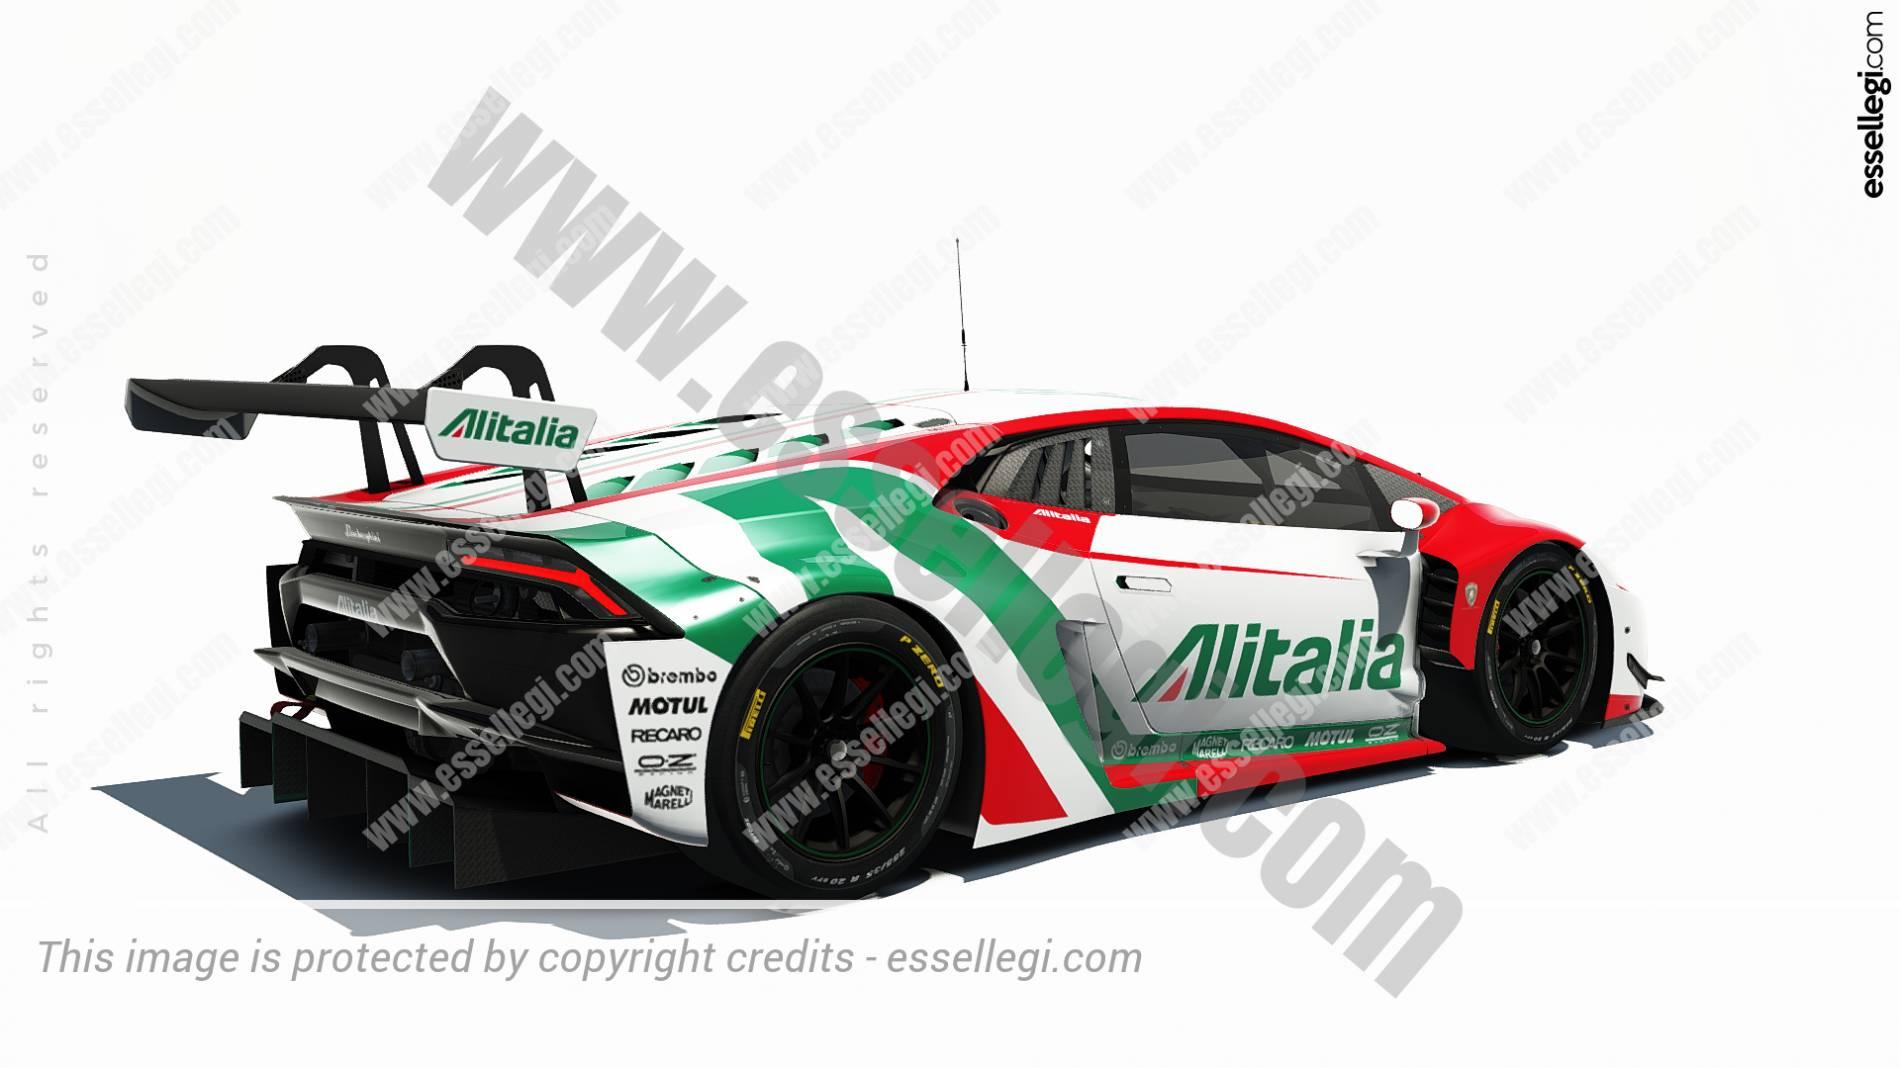 Lamborghini huracan gt3 alitalia tribute racing car livery